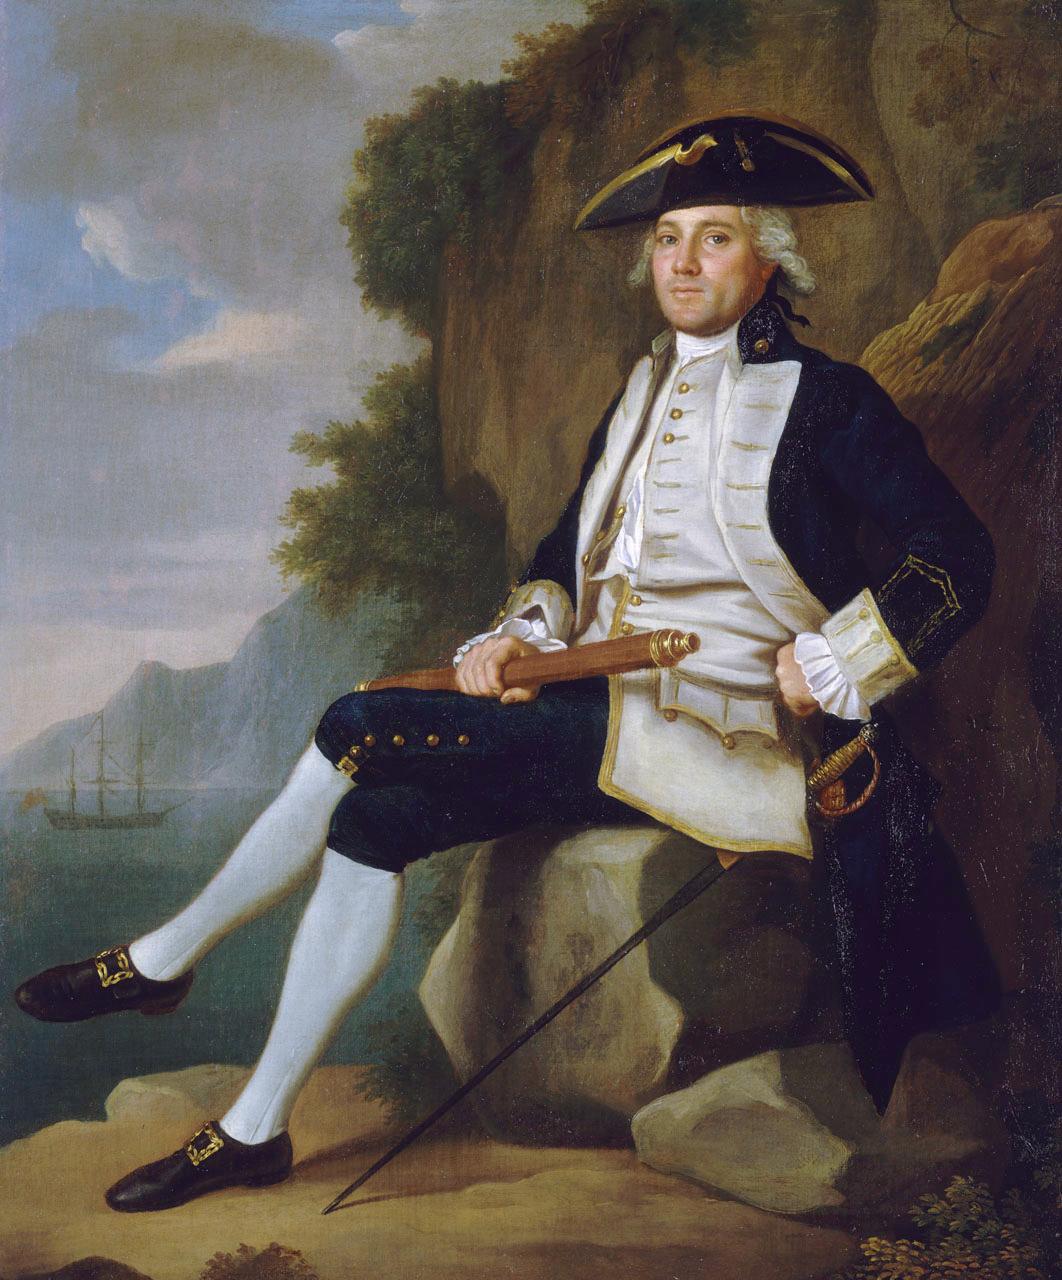 Edward Vernon (Royal Navy officer, born 1723) - Wikipedia